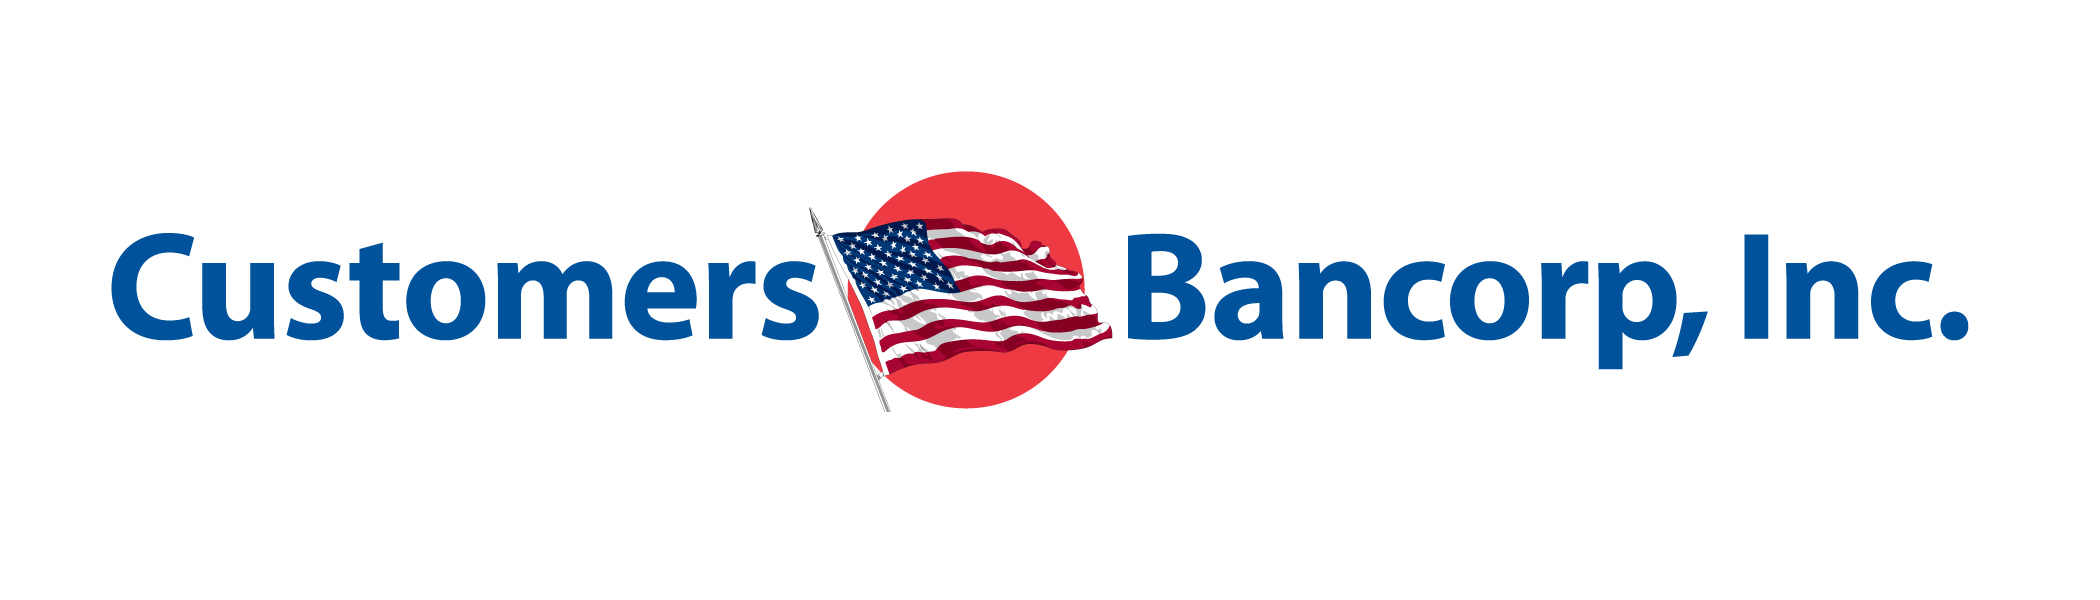 Customers Bancorp, Inc.